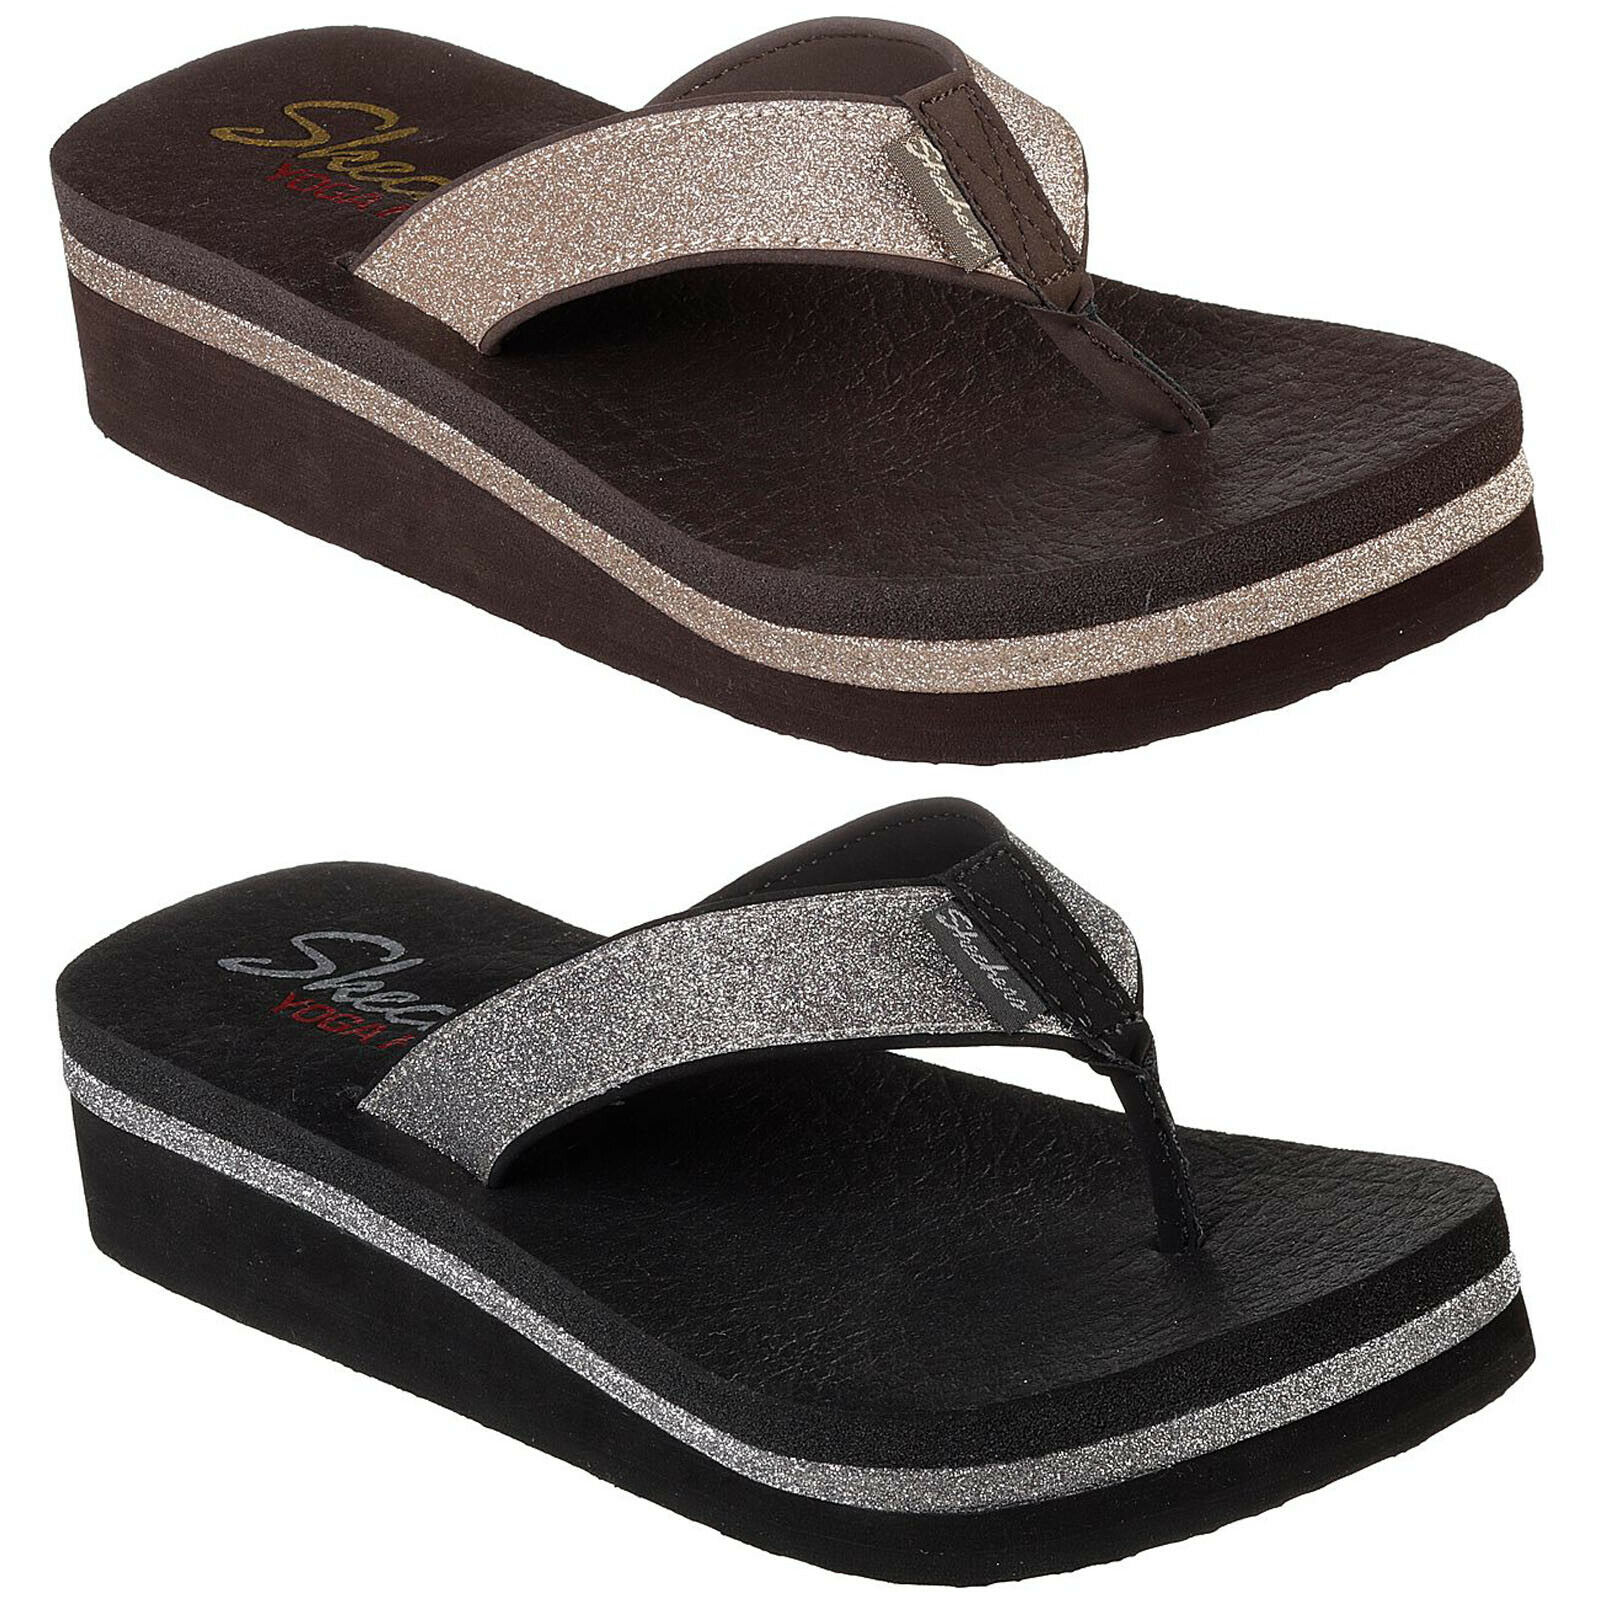 shop reputable site popular brand Details about Skechers Vinyasa - Unicorn Mist Flip Flops Womens Wedge Toe  Post Sandals 31605